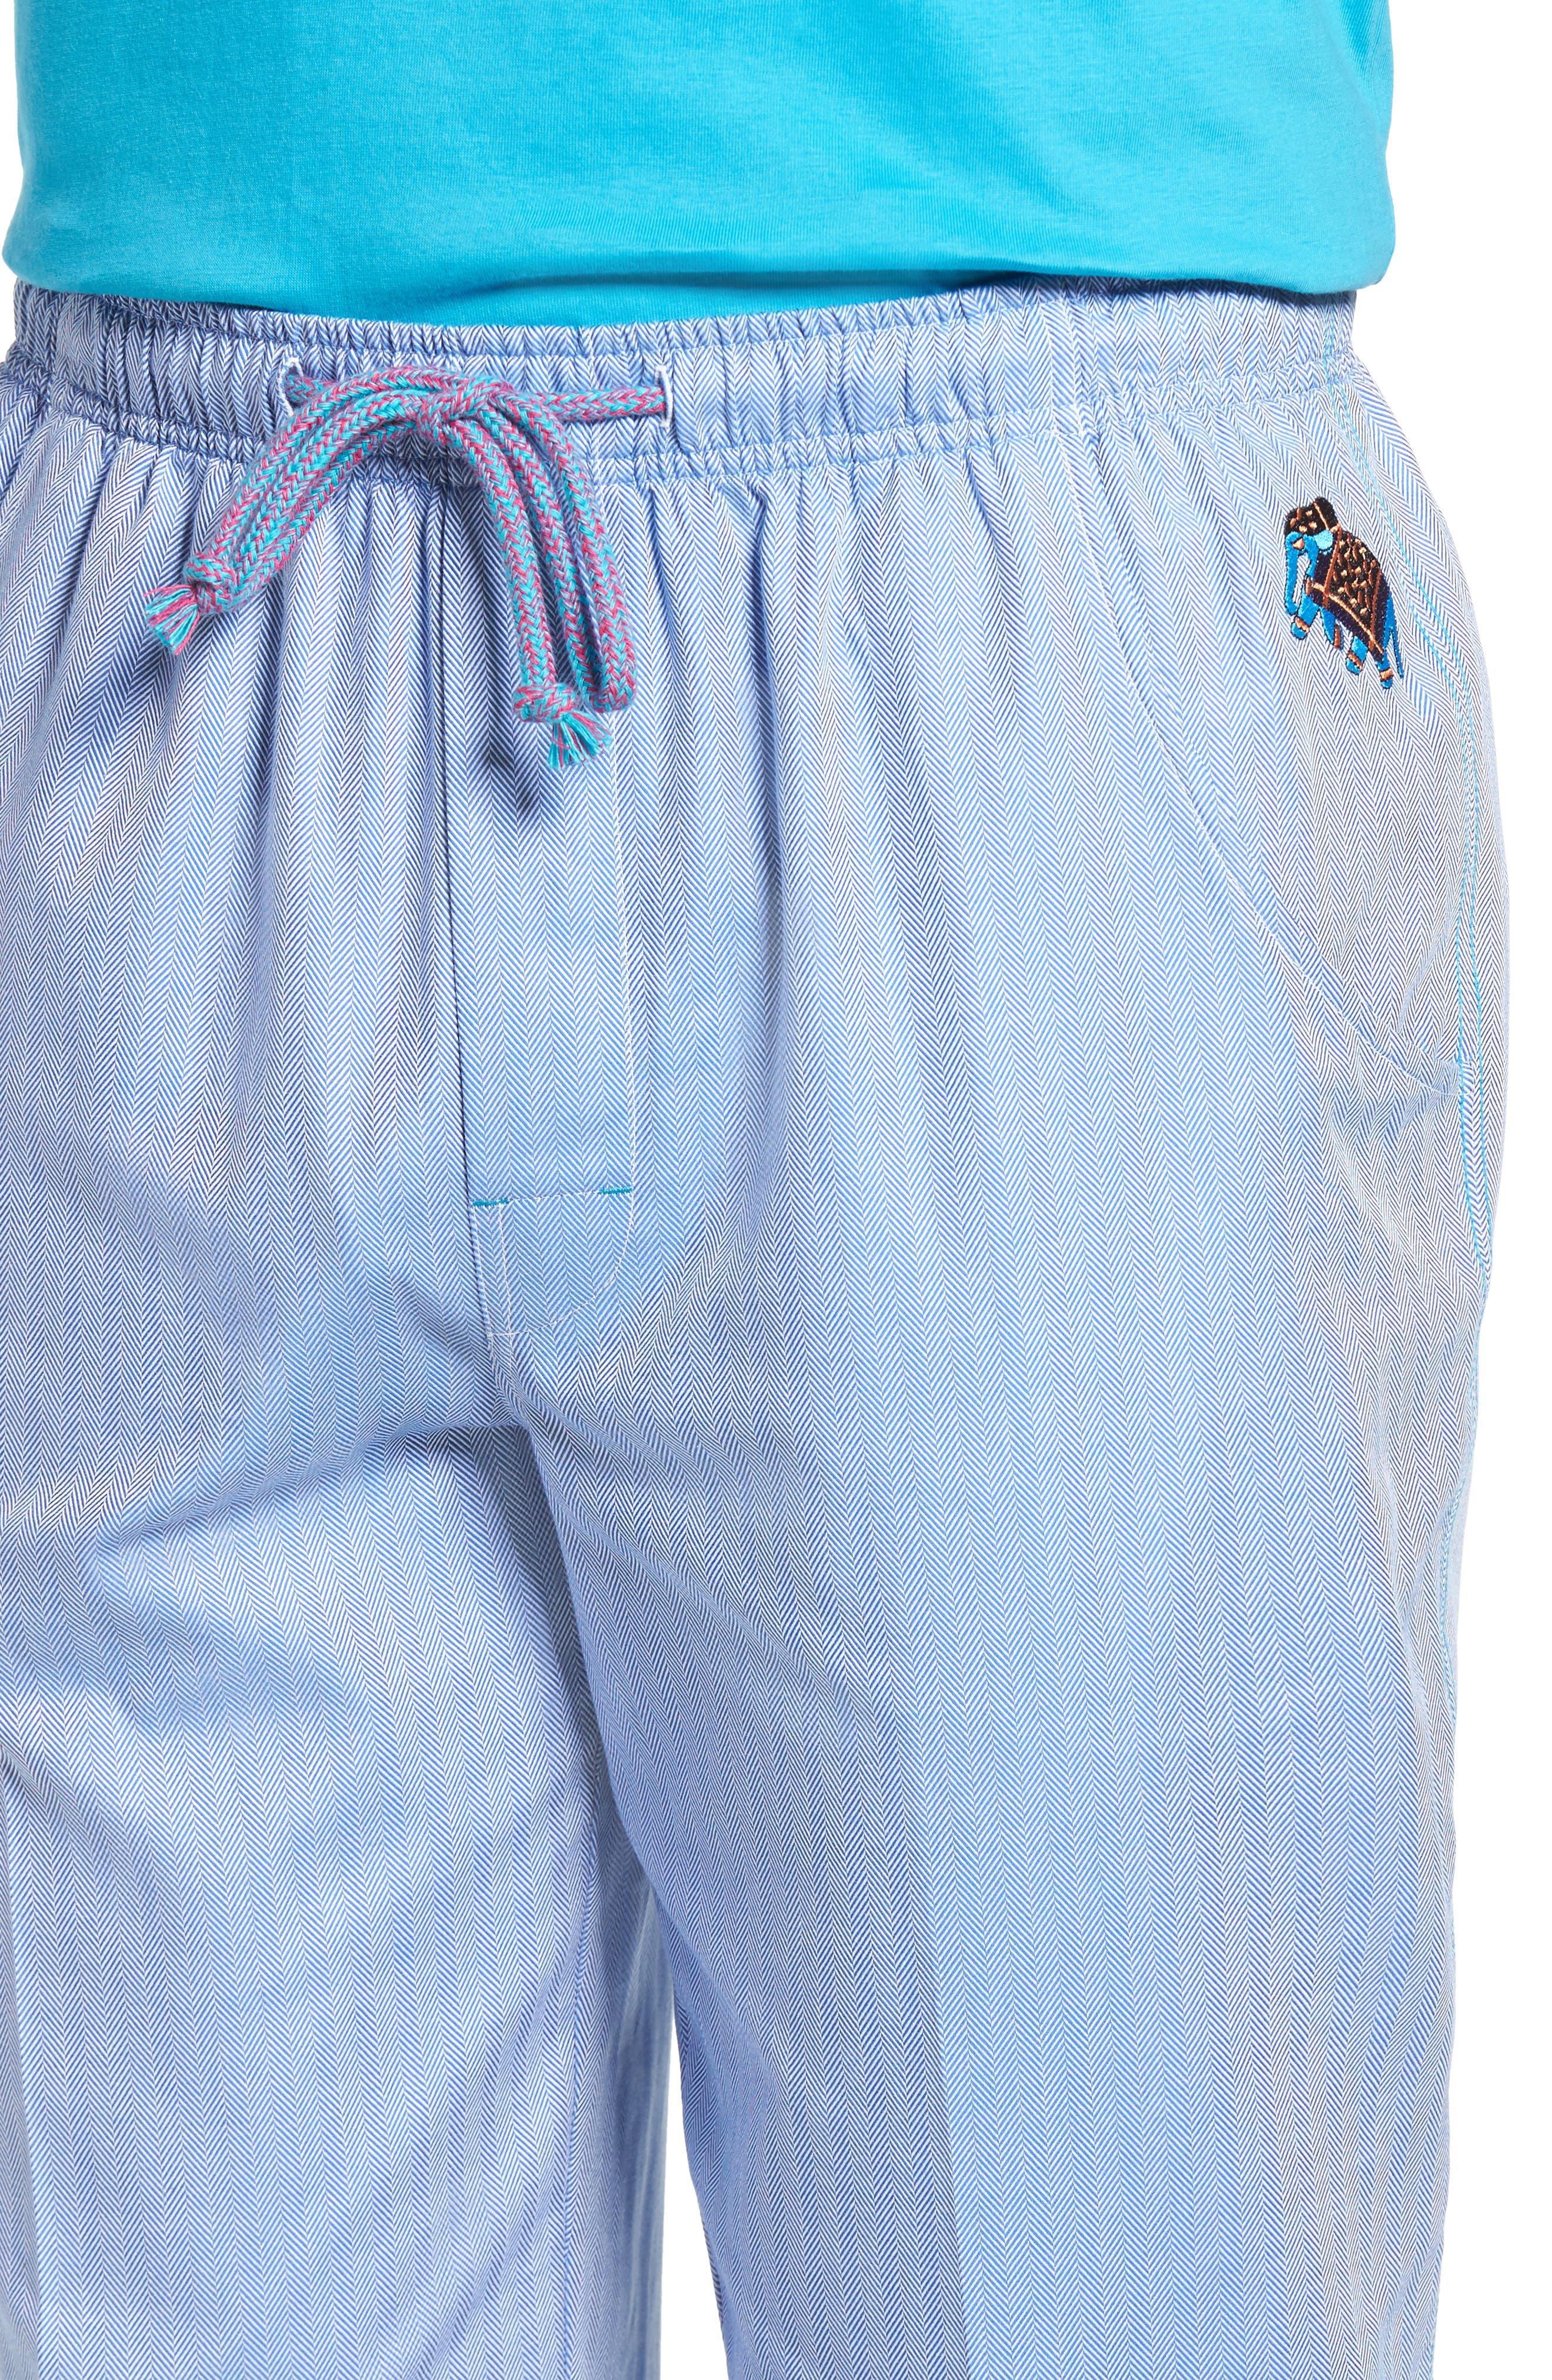 Alternate Image 4  - Robert Graham Fusion Pajama Set